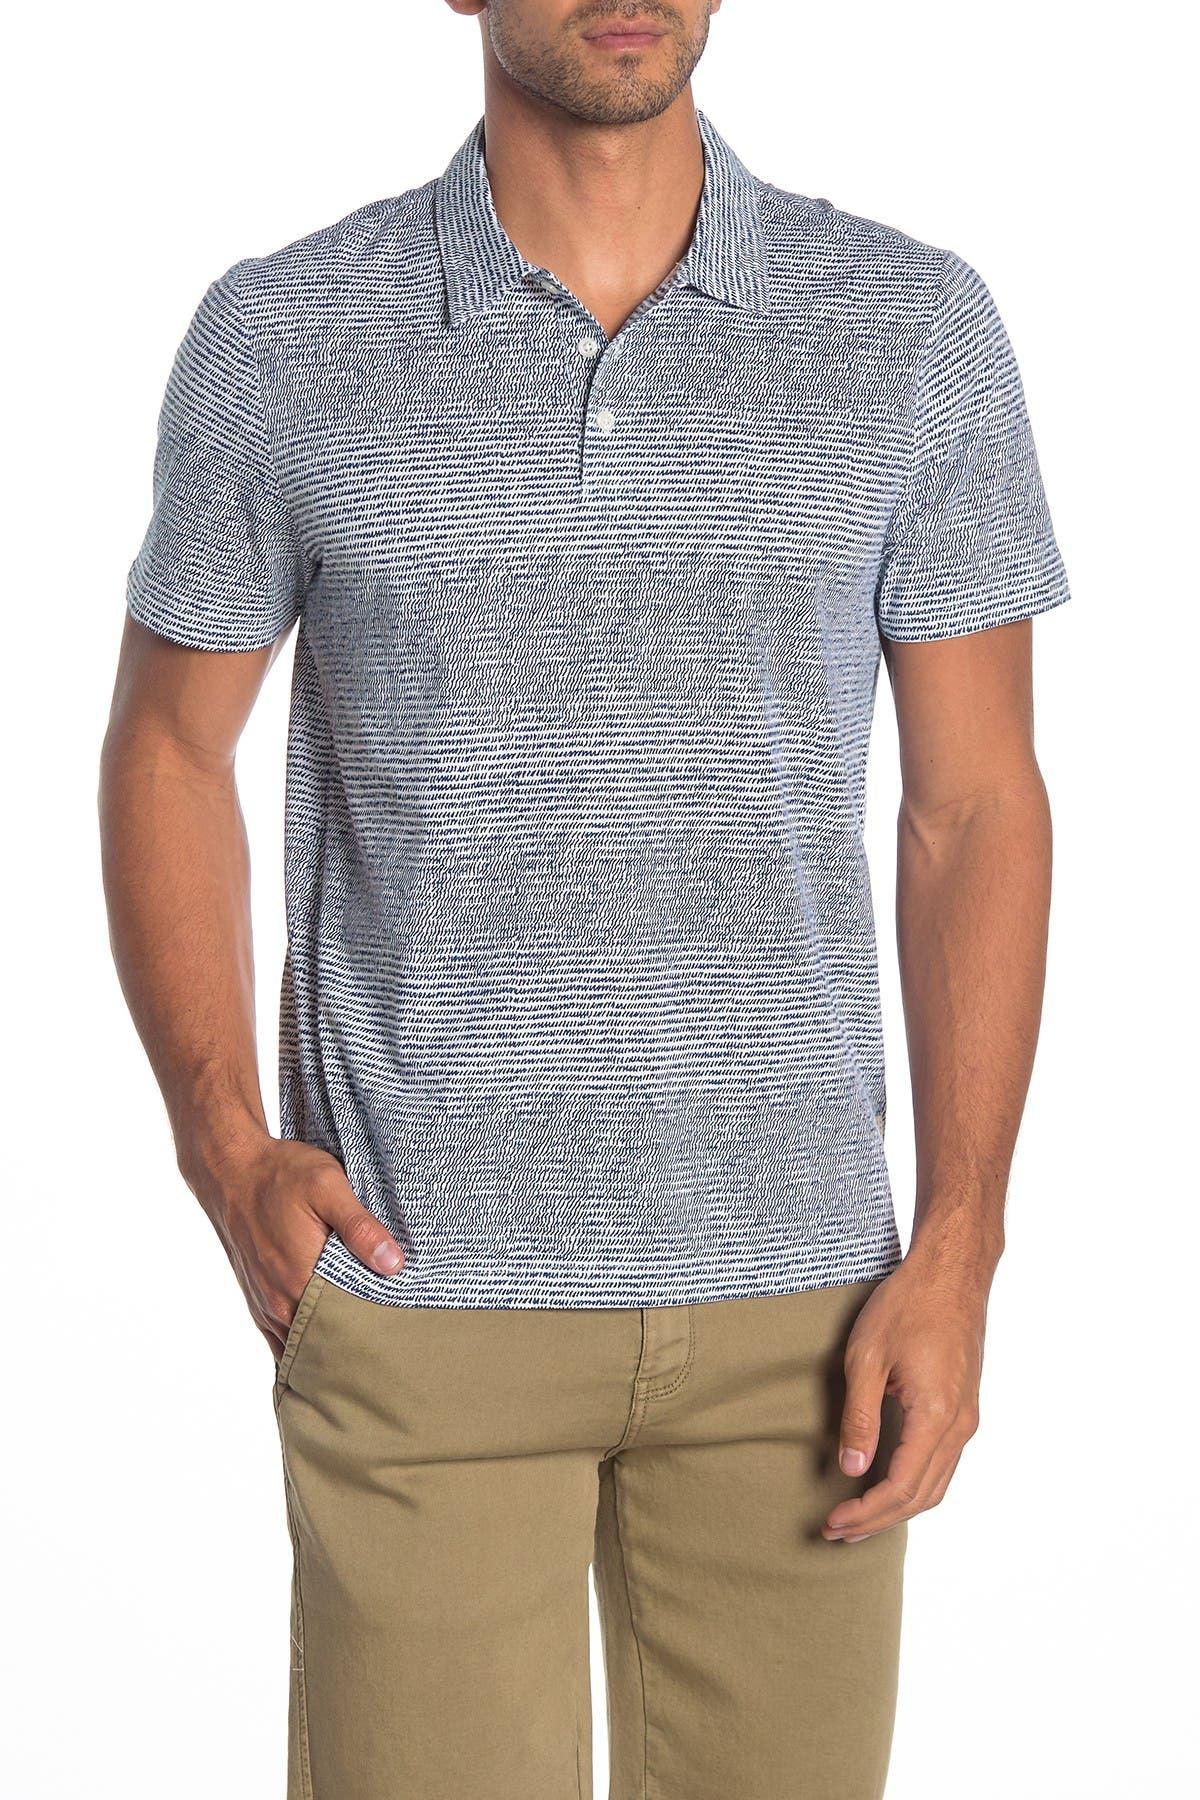 Image of Perry Ellis Short Sleeve Scribble Print Shirt